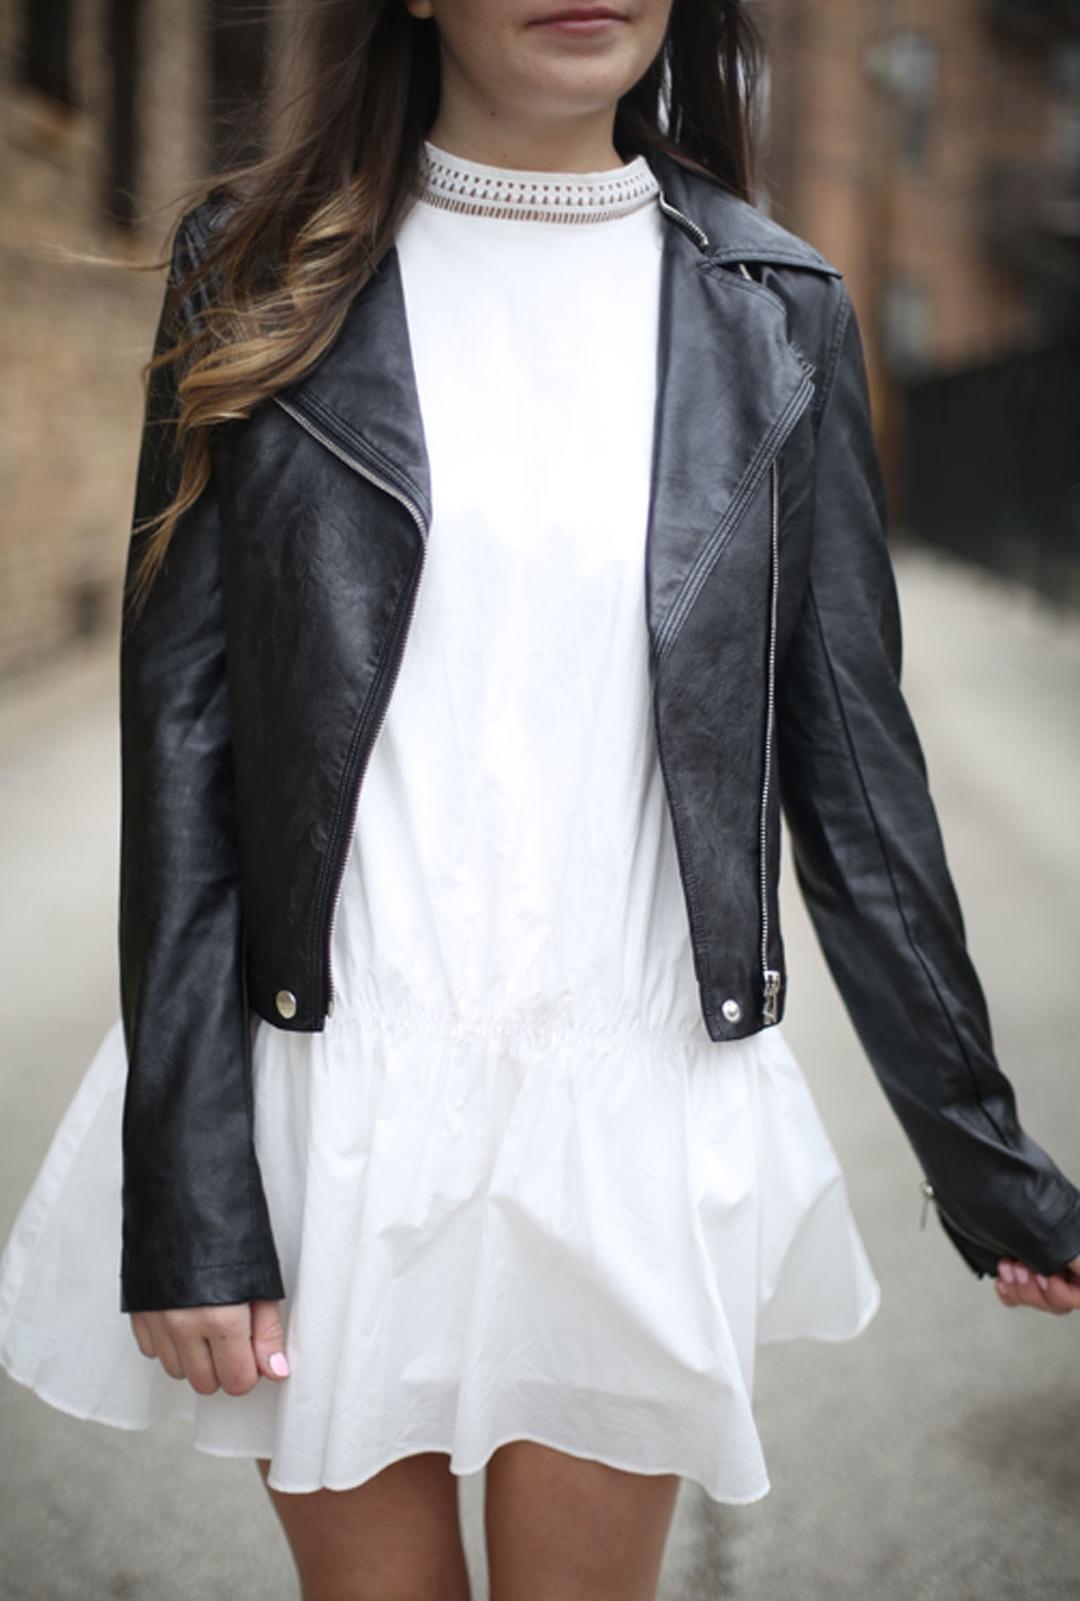 Leather Jacket Drop Waist Dress White